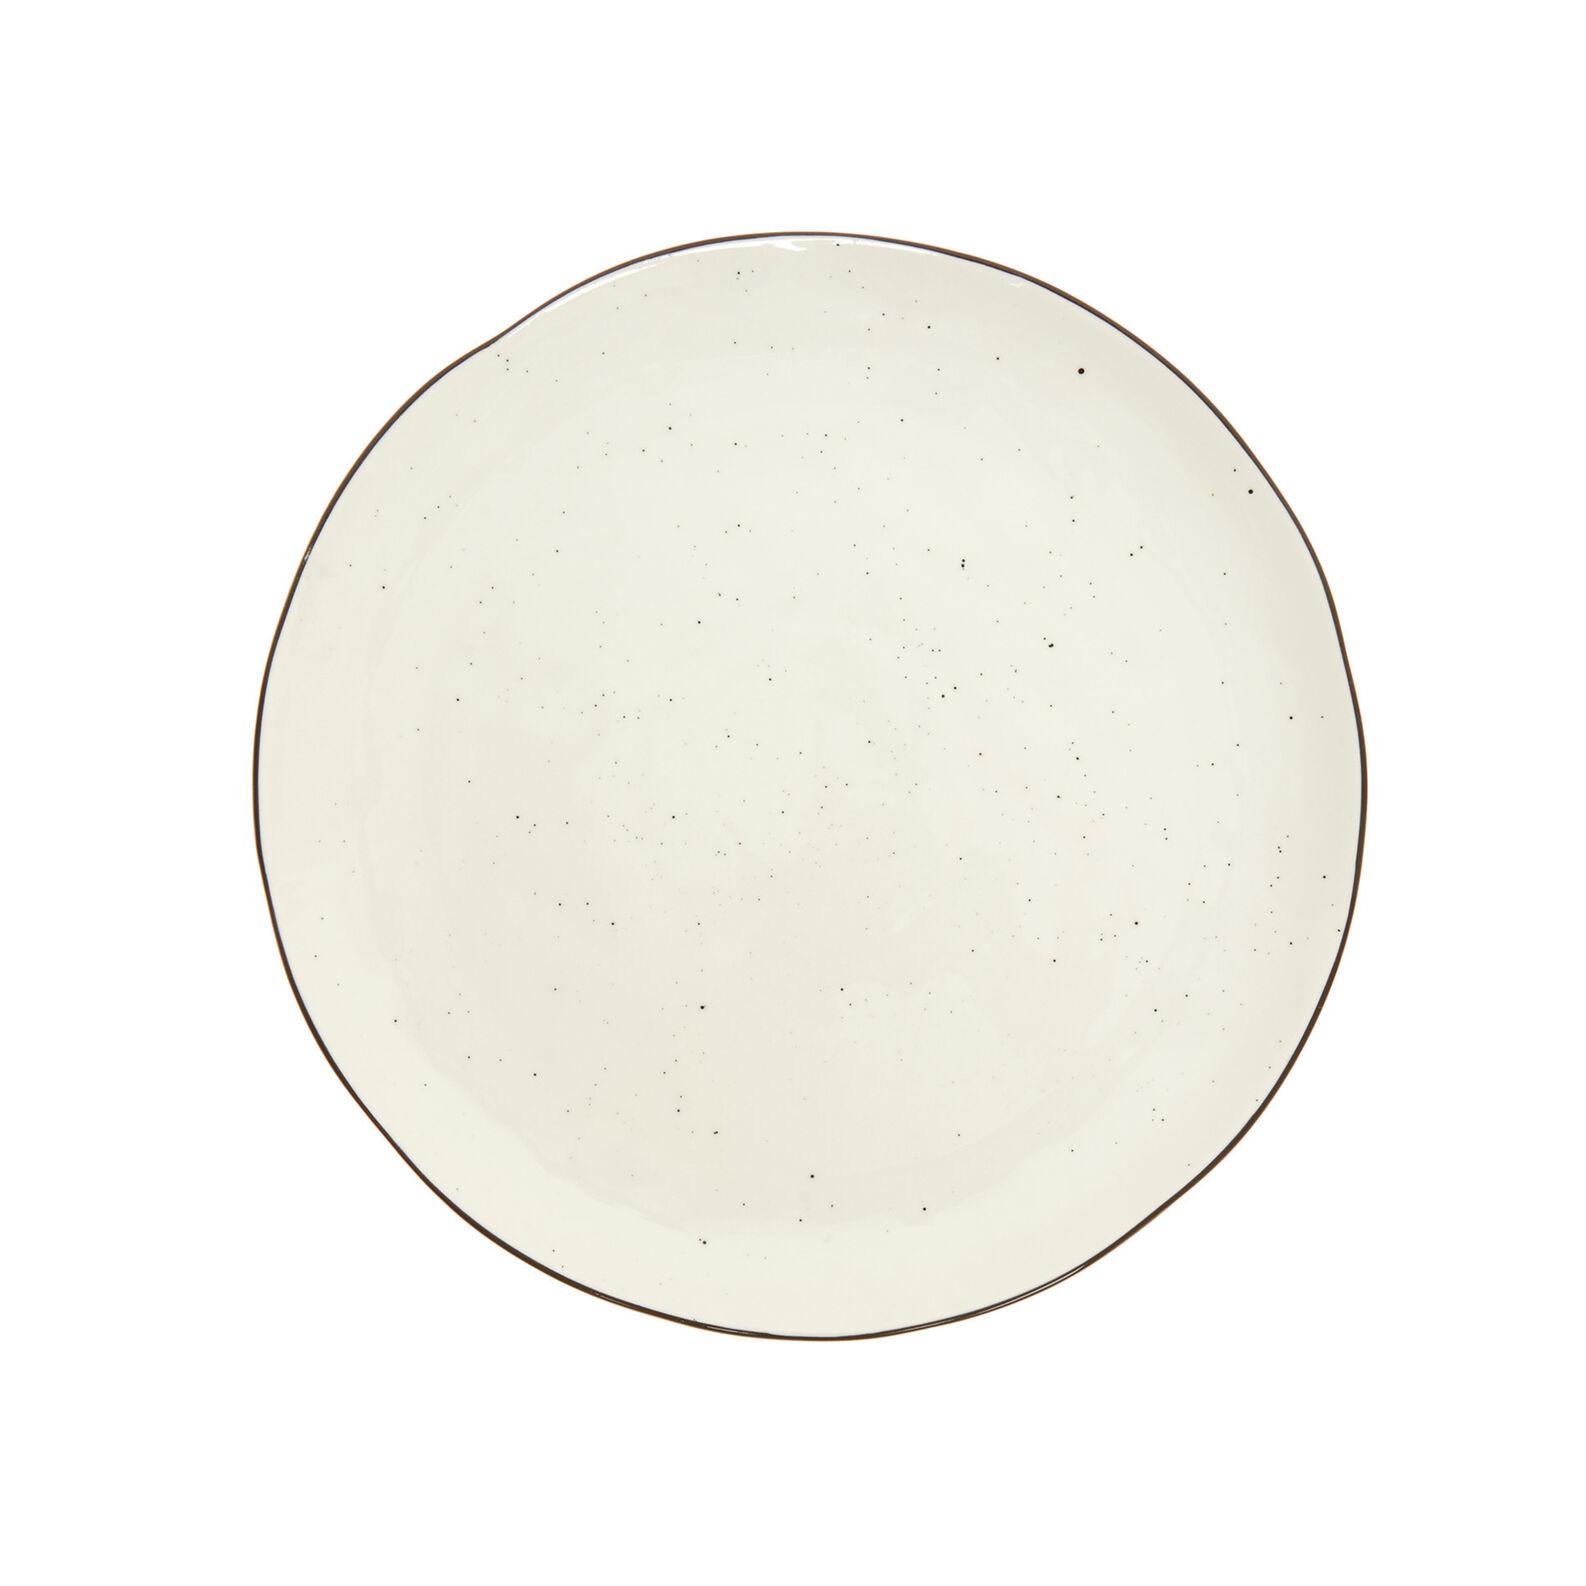 Ginevra porcelain plate